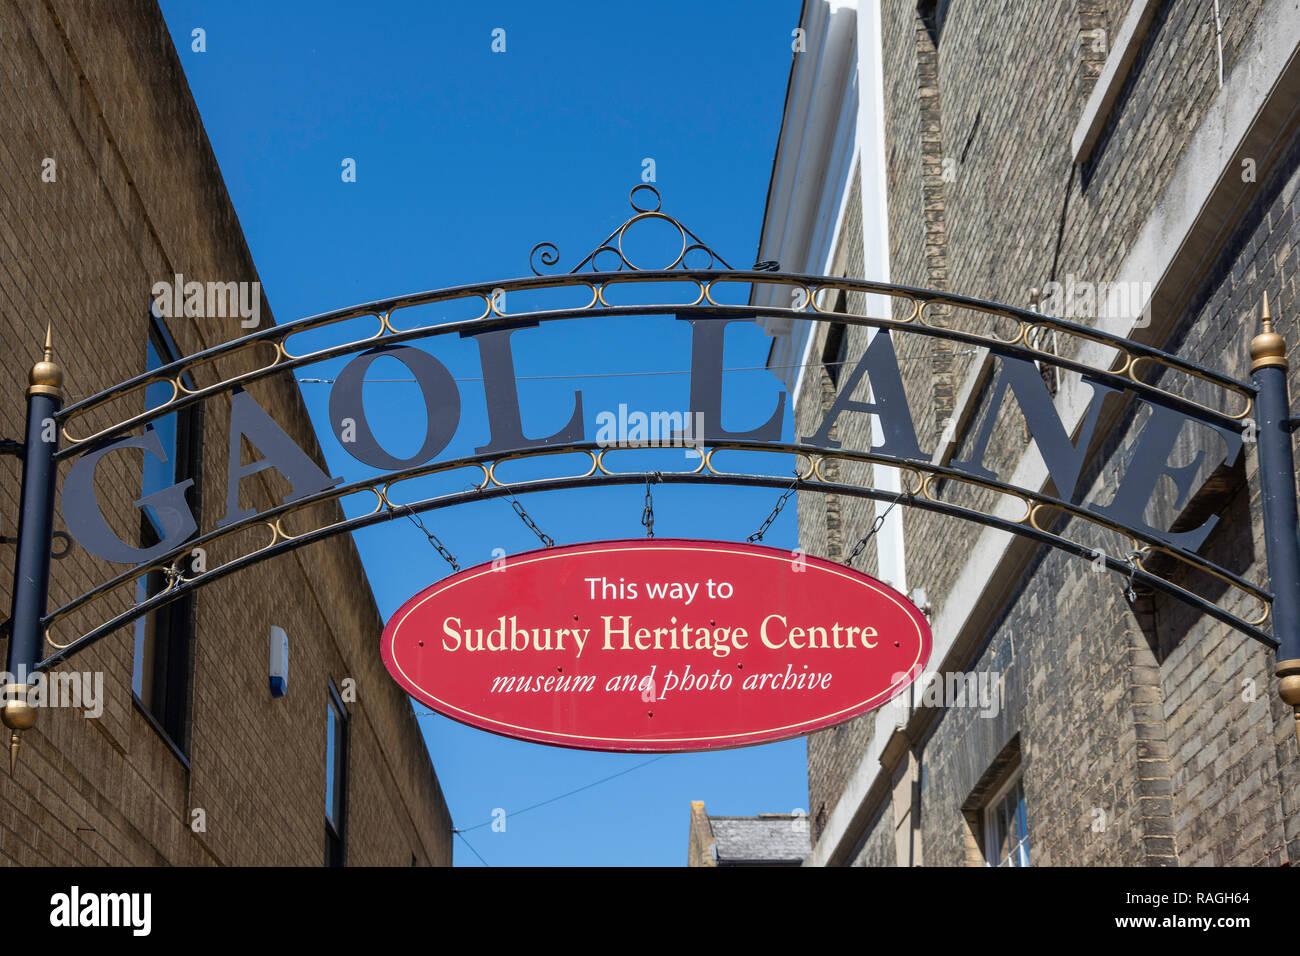 Gaol Lane & Sudbury Heritage Centre sign, Goal Lane, Sudbury, Suffolk, England, United Kingdom - Stock Image